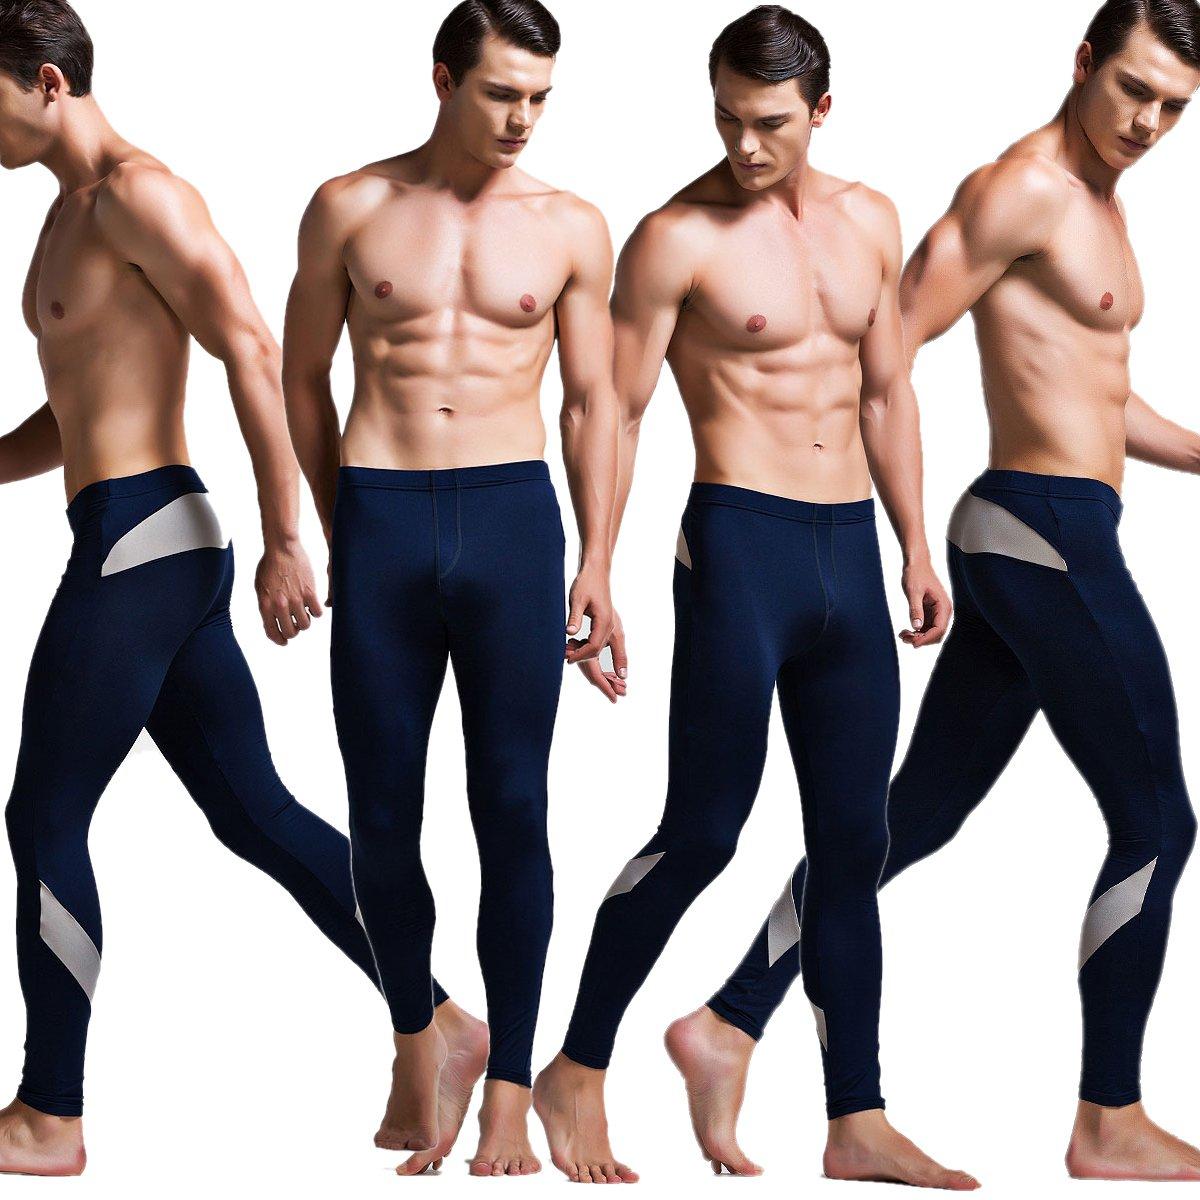 Yeke Men Long Johns Cotton Warm Thermal Underwear Solid Soft Underpants SP01